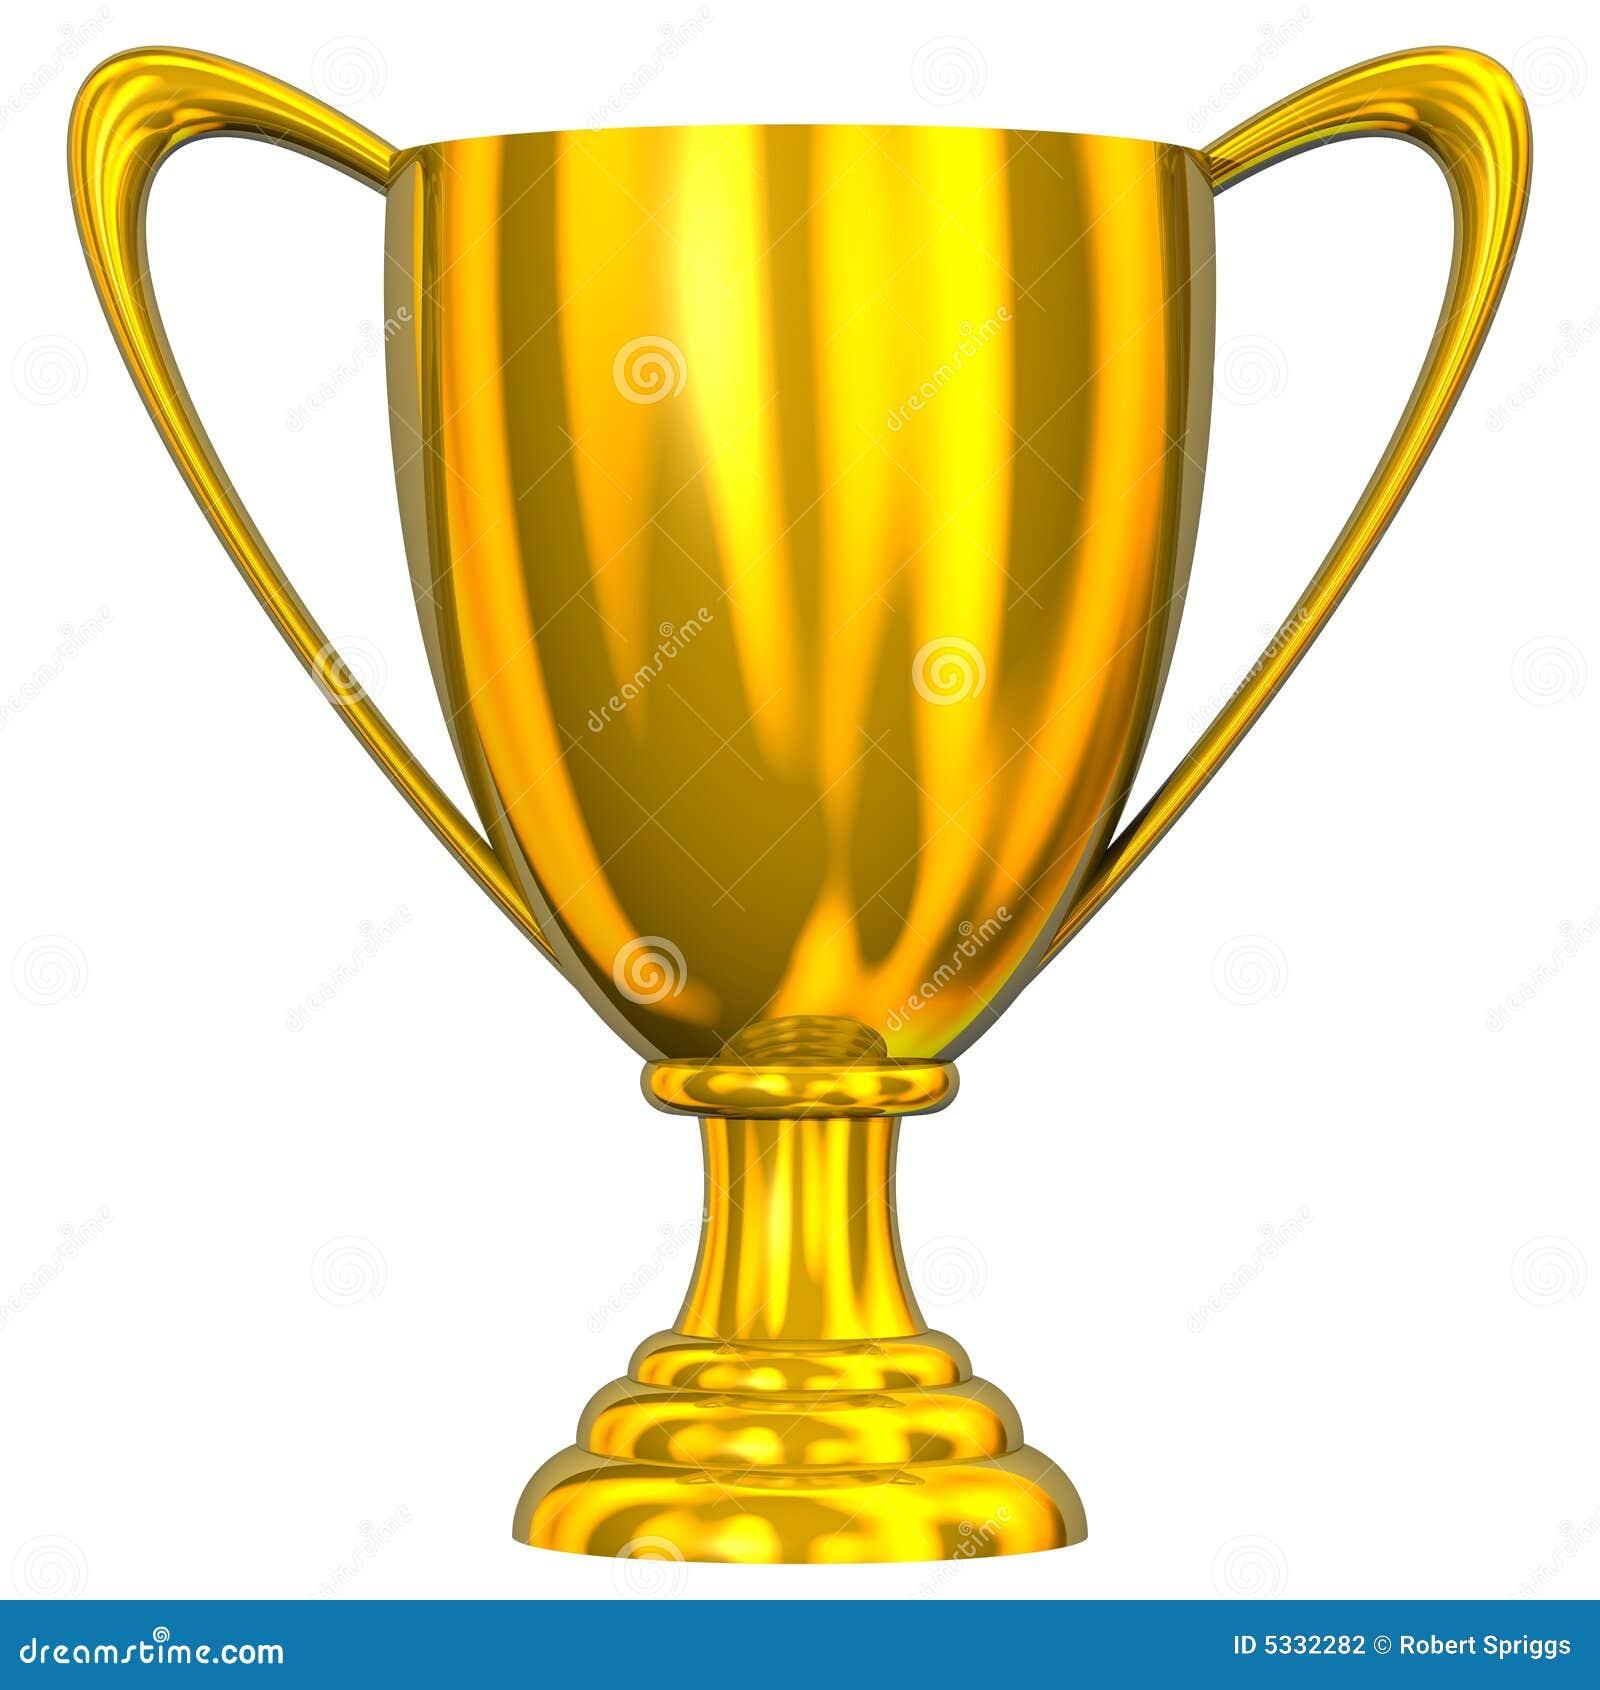 DmzQ4iPMyUScw moreover Best Smiles Of The 2014 Academy Awards as well Silver Screen Veteran Kirk Douglas Celebrates 100th Birthday n 13527418 likewise Christopher Robin Tom Mccarthy Disney as well Oscar O Dia Dos Melhores Melhores. on the oscar trophy